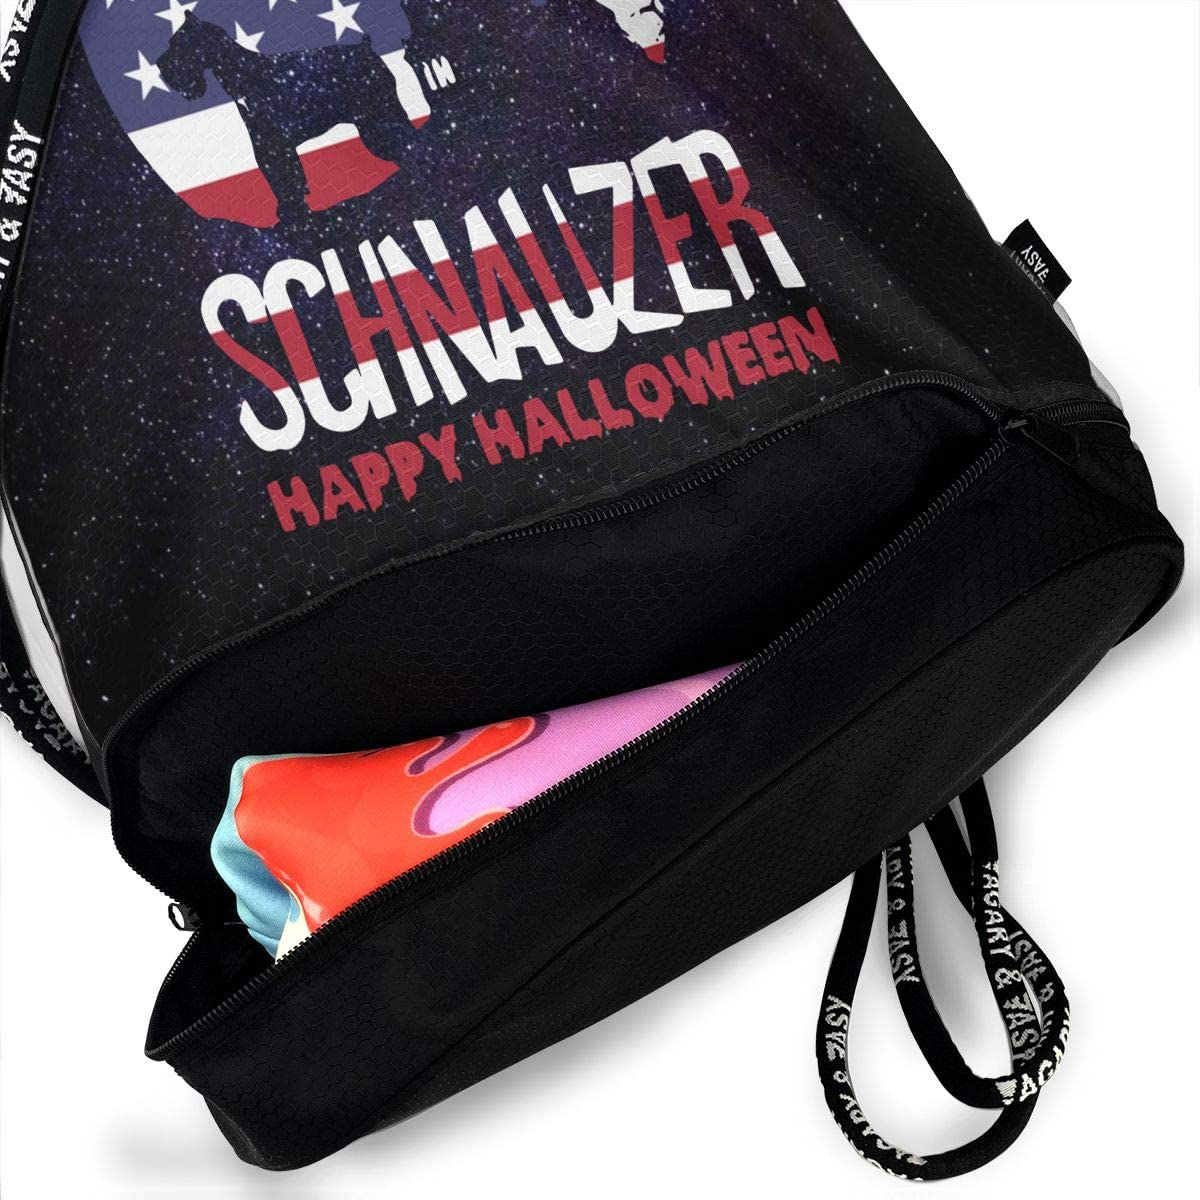 SG0HGO Drawstring Backpack Bag Happy Halloween American Flag Men /& Women Home Travel Shopping Shoulder Bags